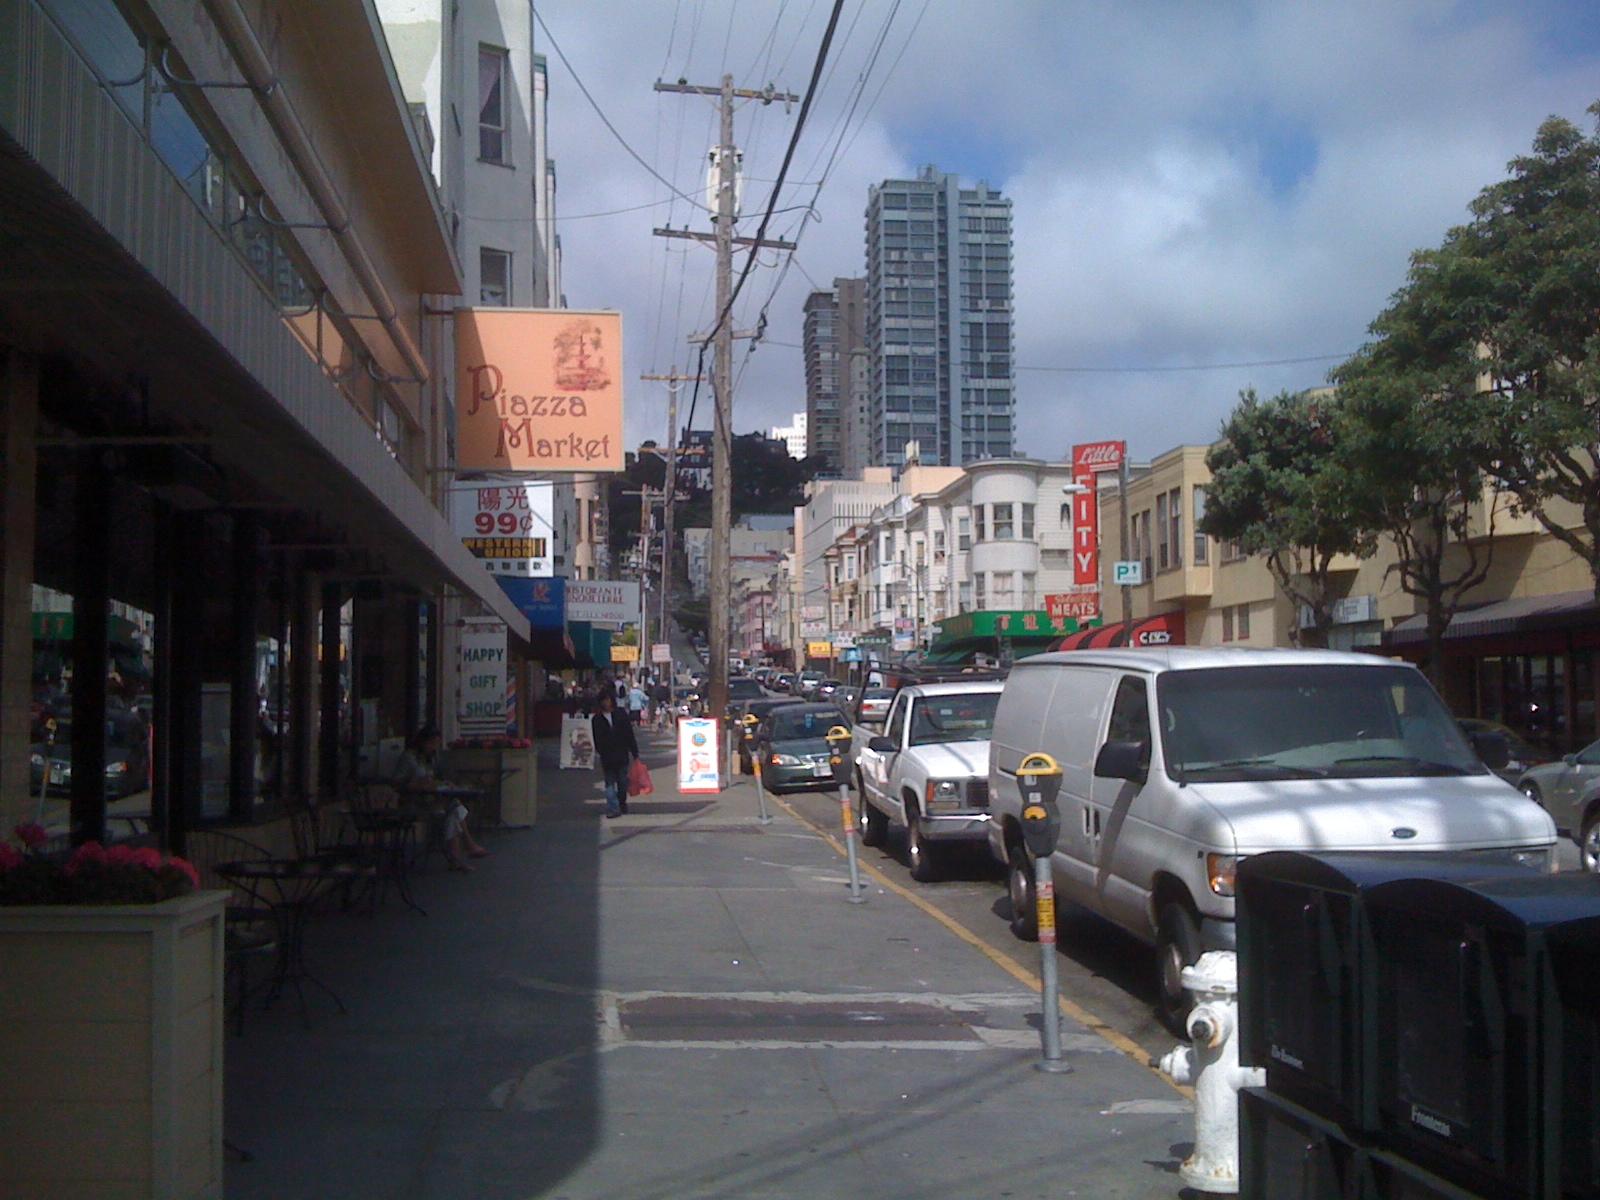 Where Chinatown and Italy merged